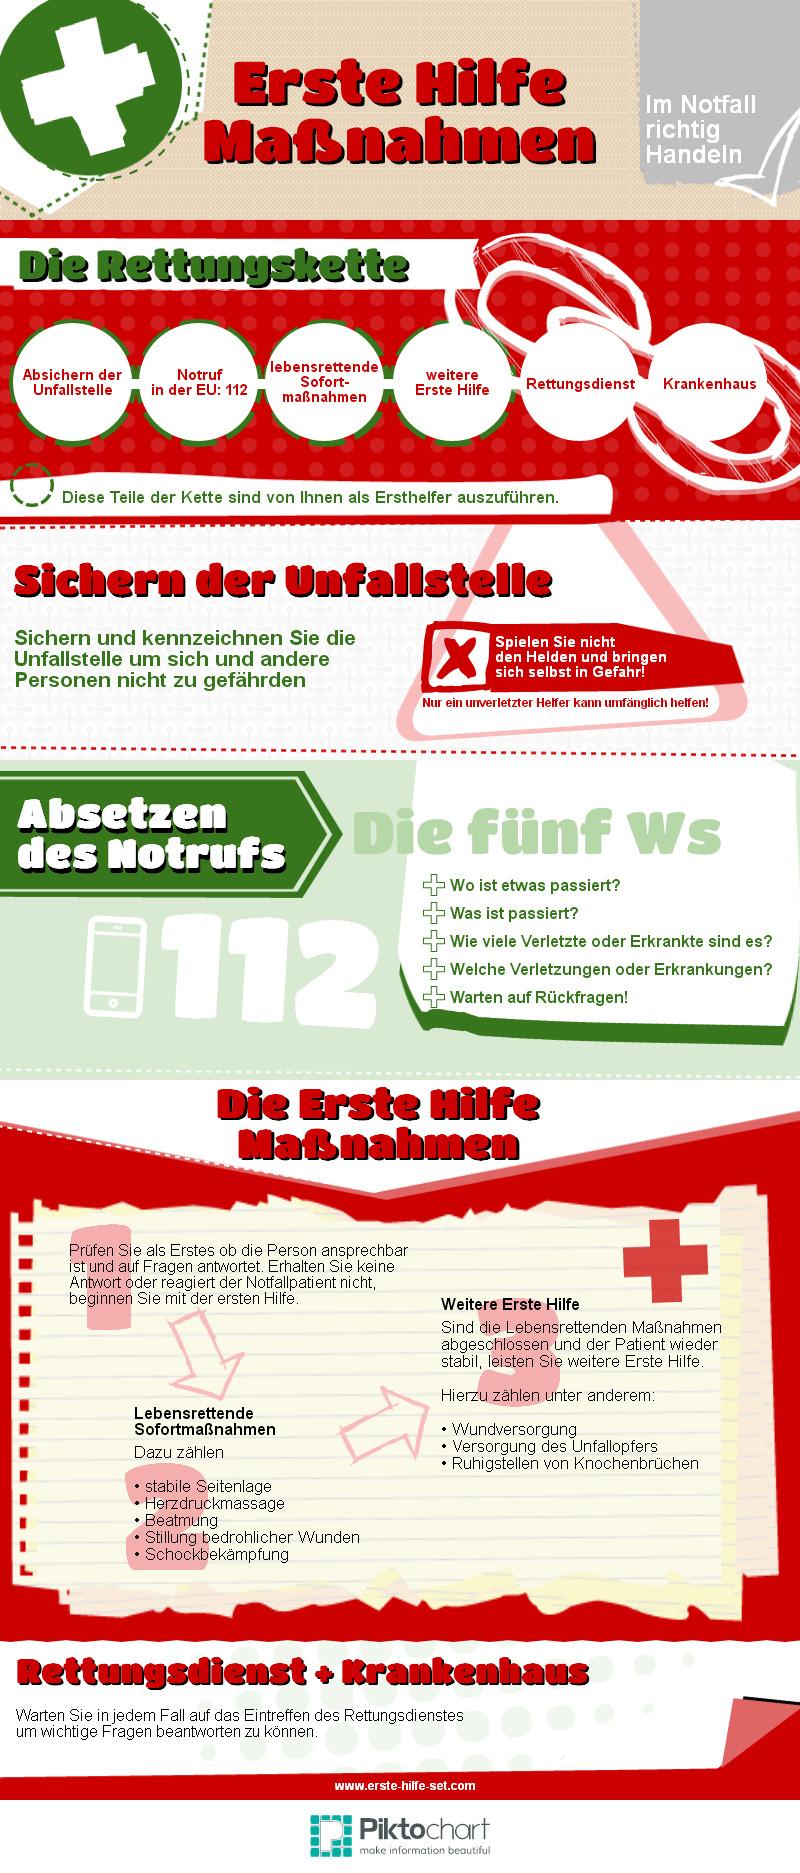 Grafik: Erste Hilfe Massnahmen